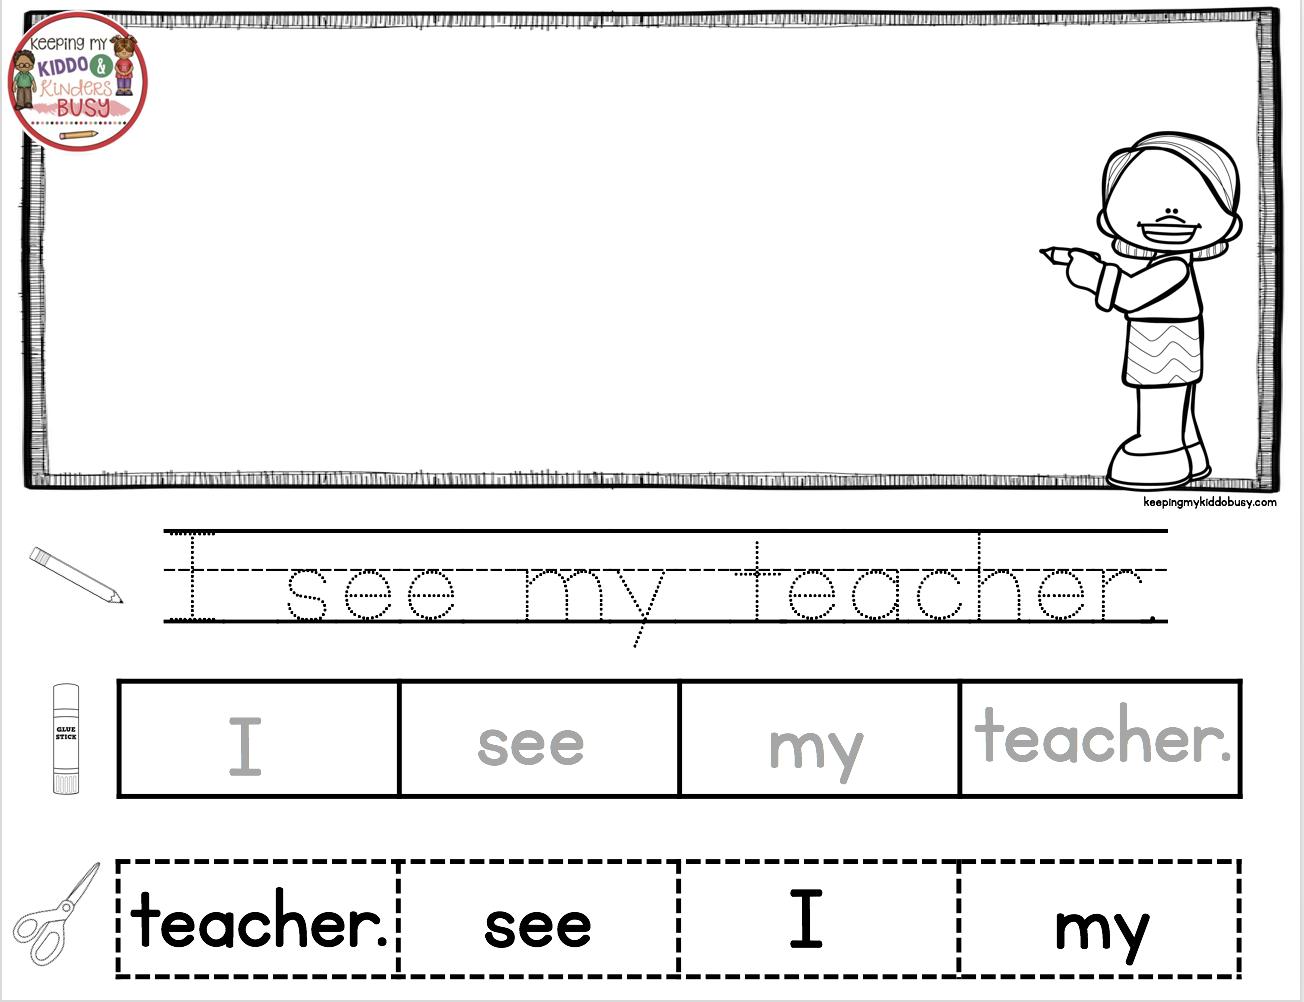 Reading And Writing Back To School In Kindergarten Free Week Keeping My Kiddo Busy Writing Station Kindergarten Kindergarten Writing Sentences Kindergarten [ 1002 x 1304 Pixel ]